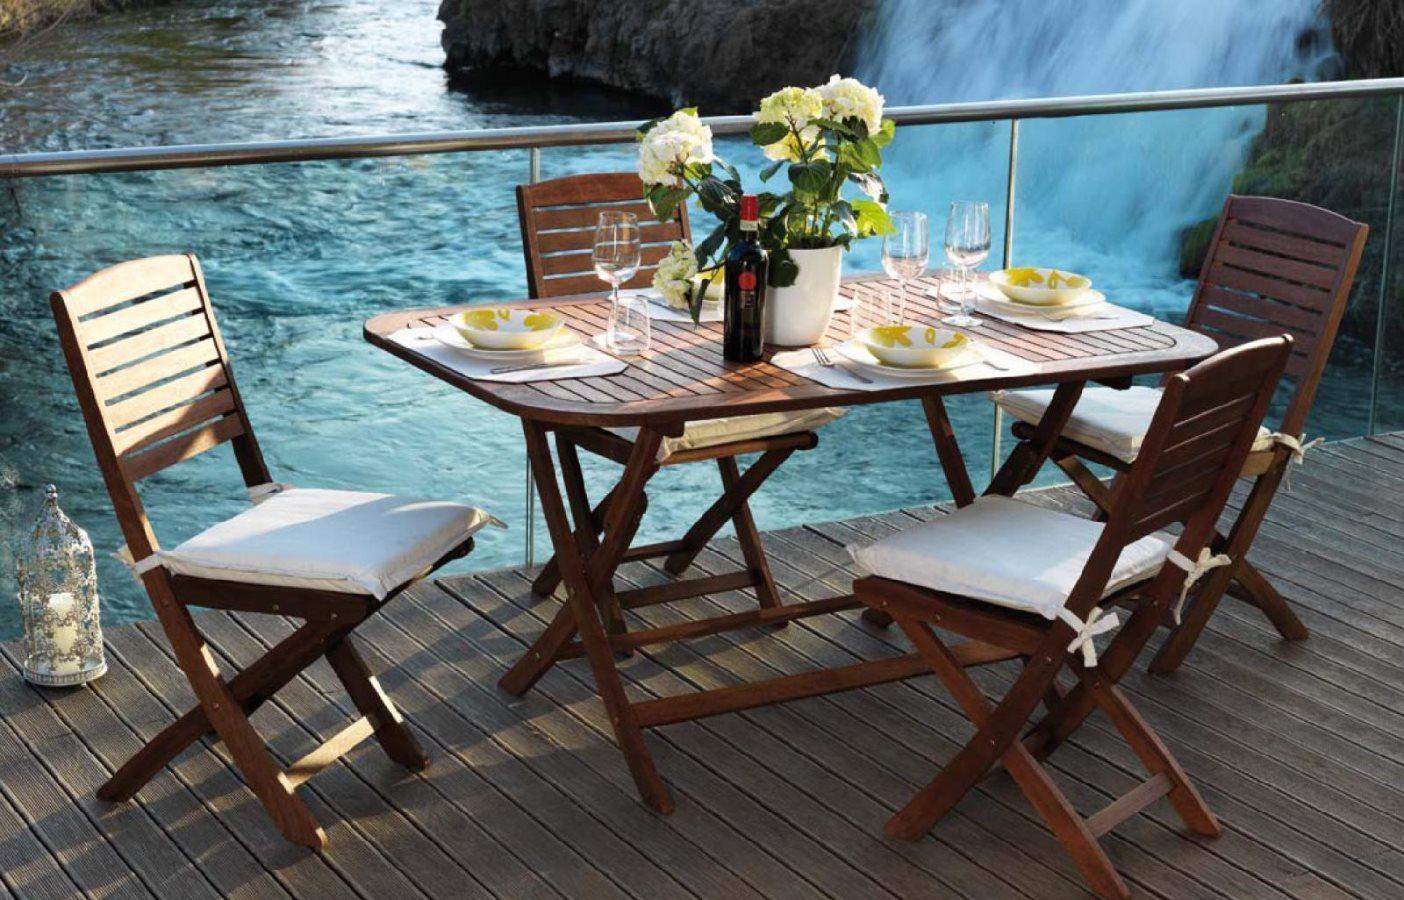 Tavolo da giardino in legno flower 150x90x74h arredo giardino e